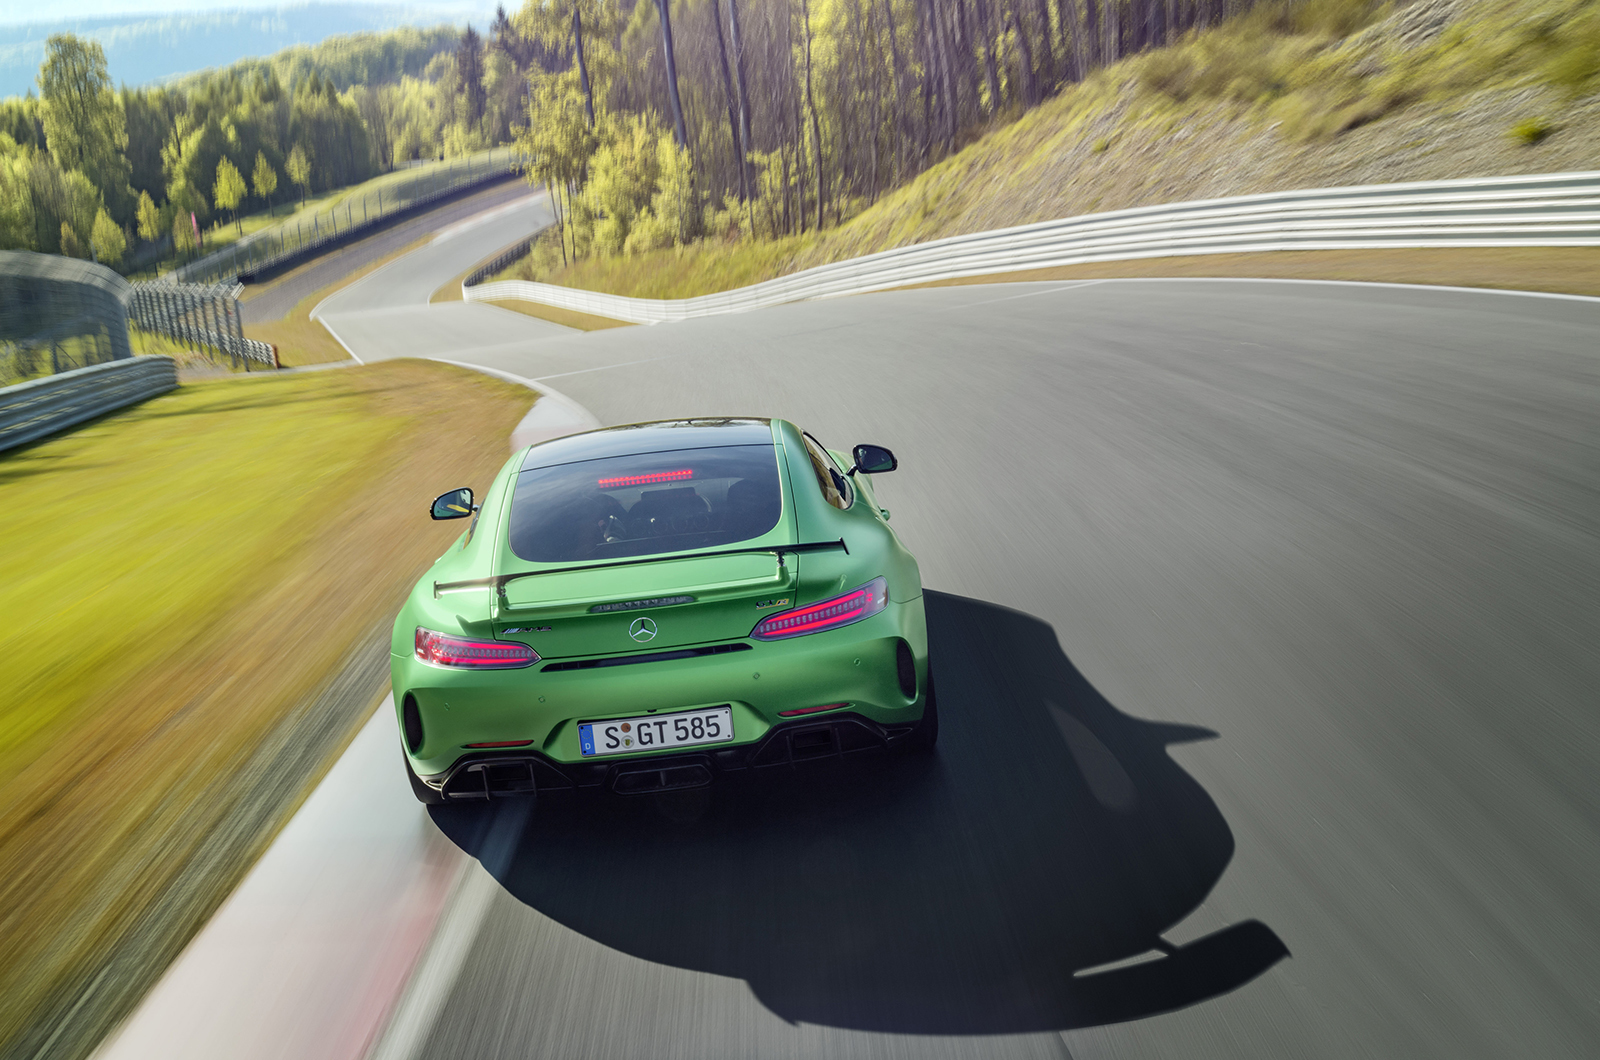 Mercedes AMG GT R Wallpaper For Windows